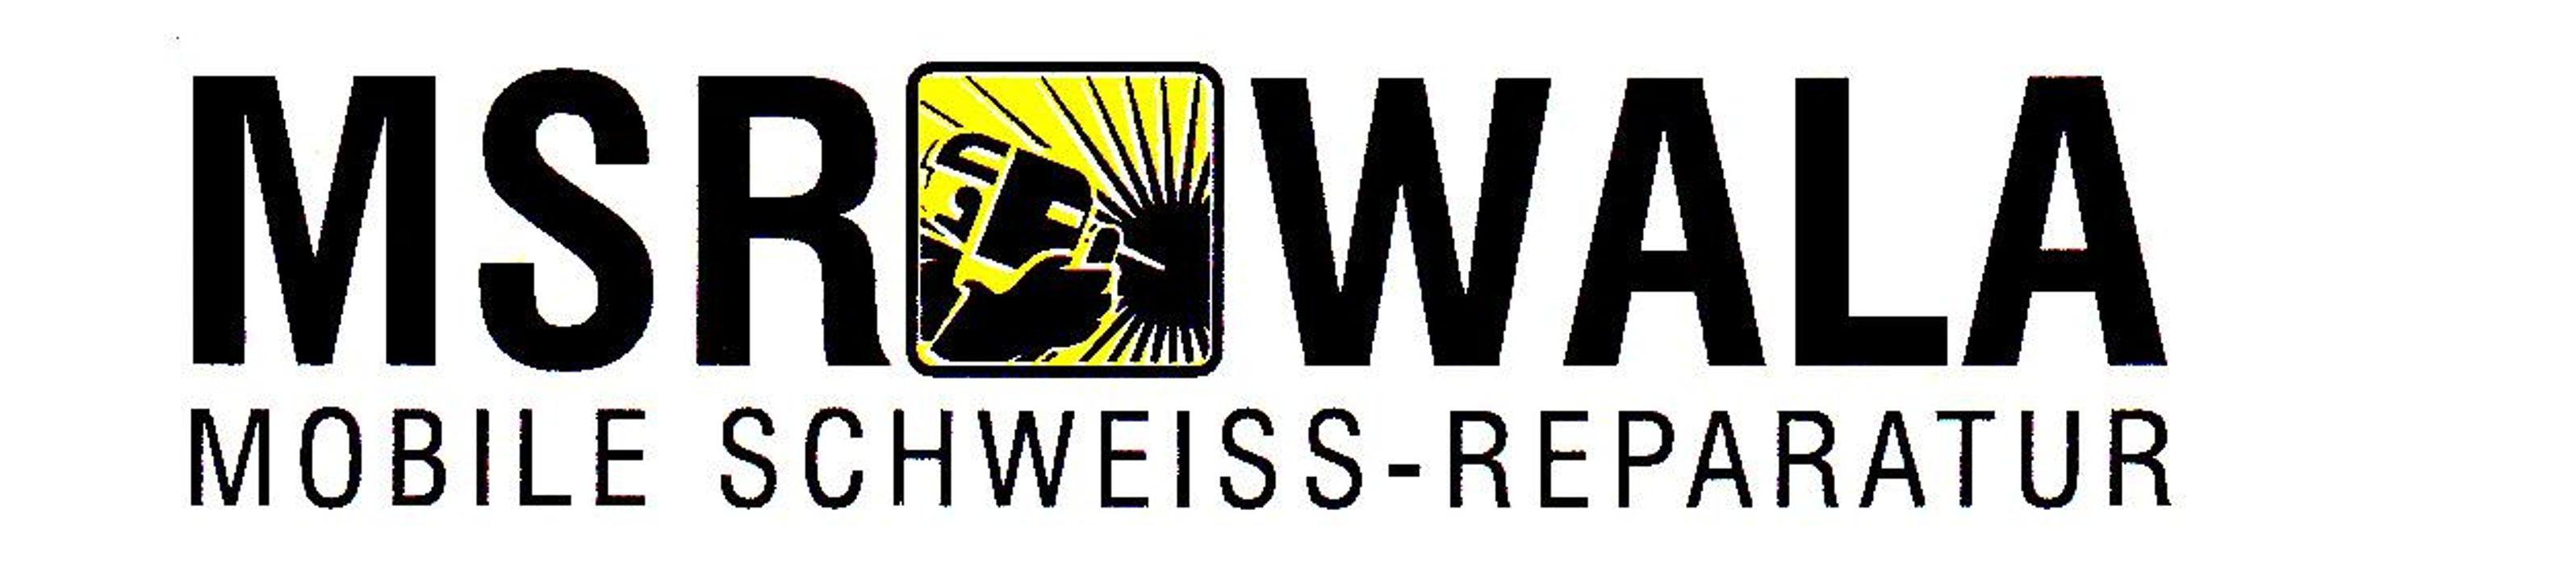 Bild zu MSR Wala Mobile Schweiss-Reparatur in Oftersheim